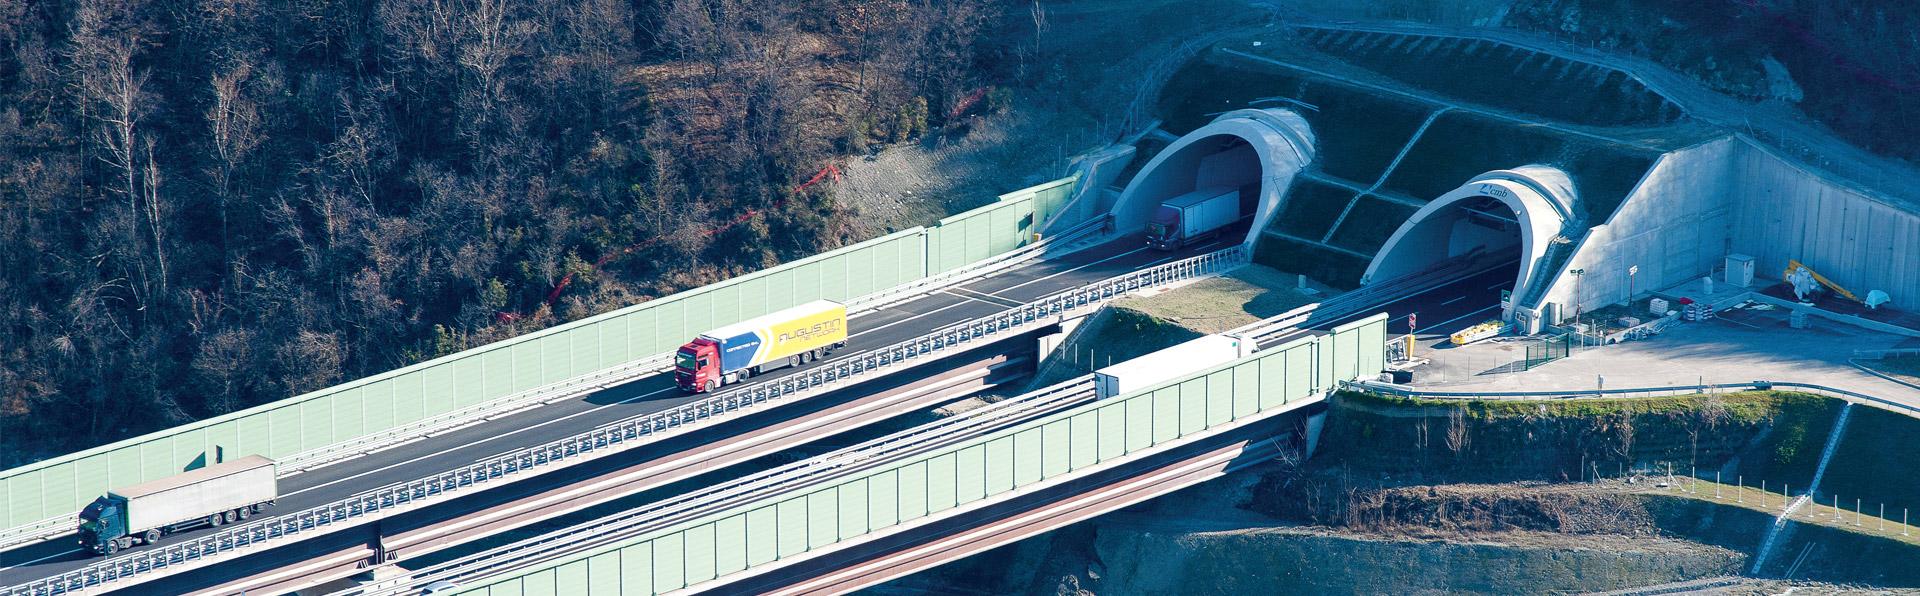 variante-di-valico-bologna-firenze-autostrada-al-motorway